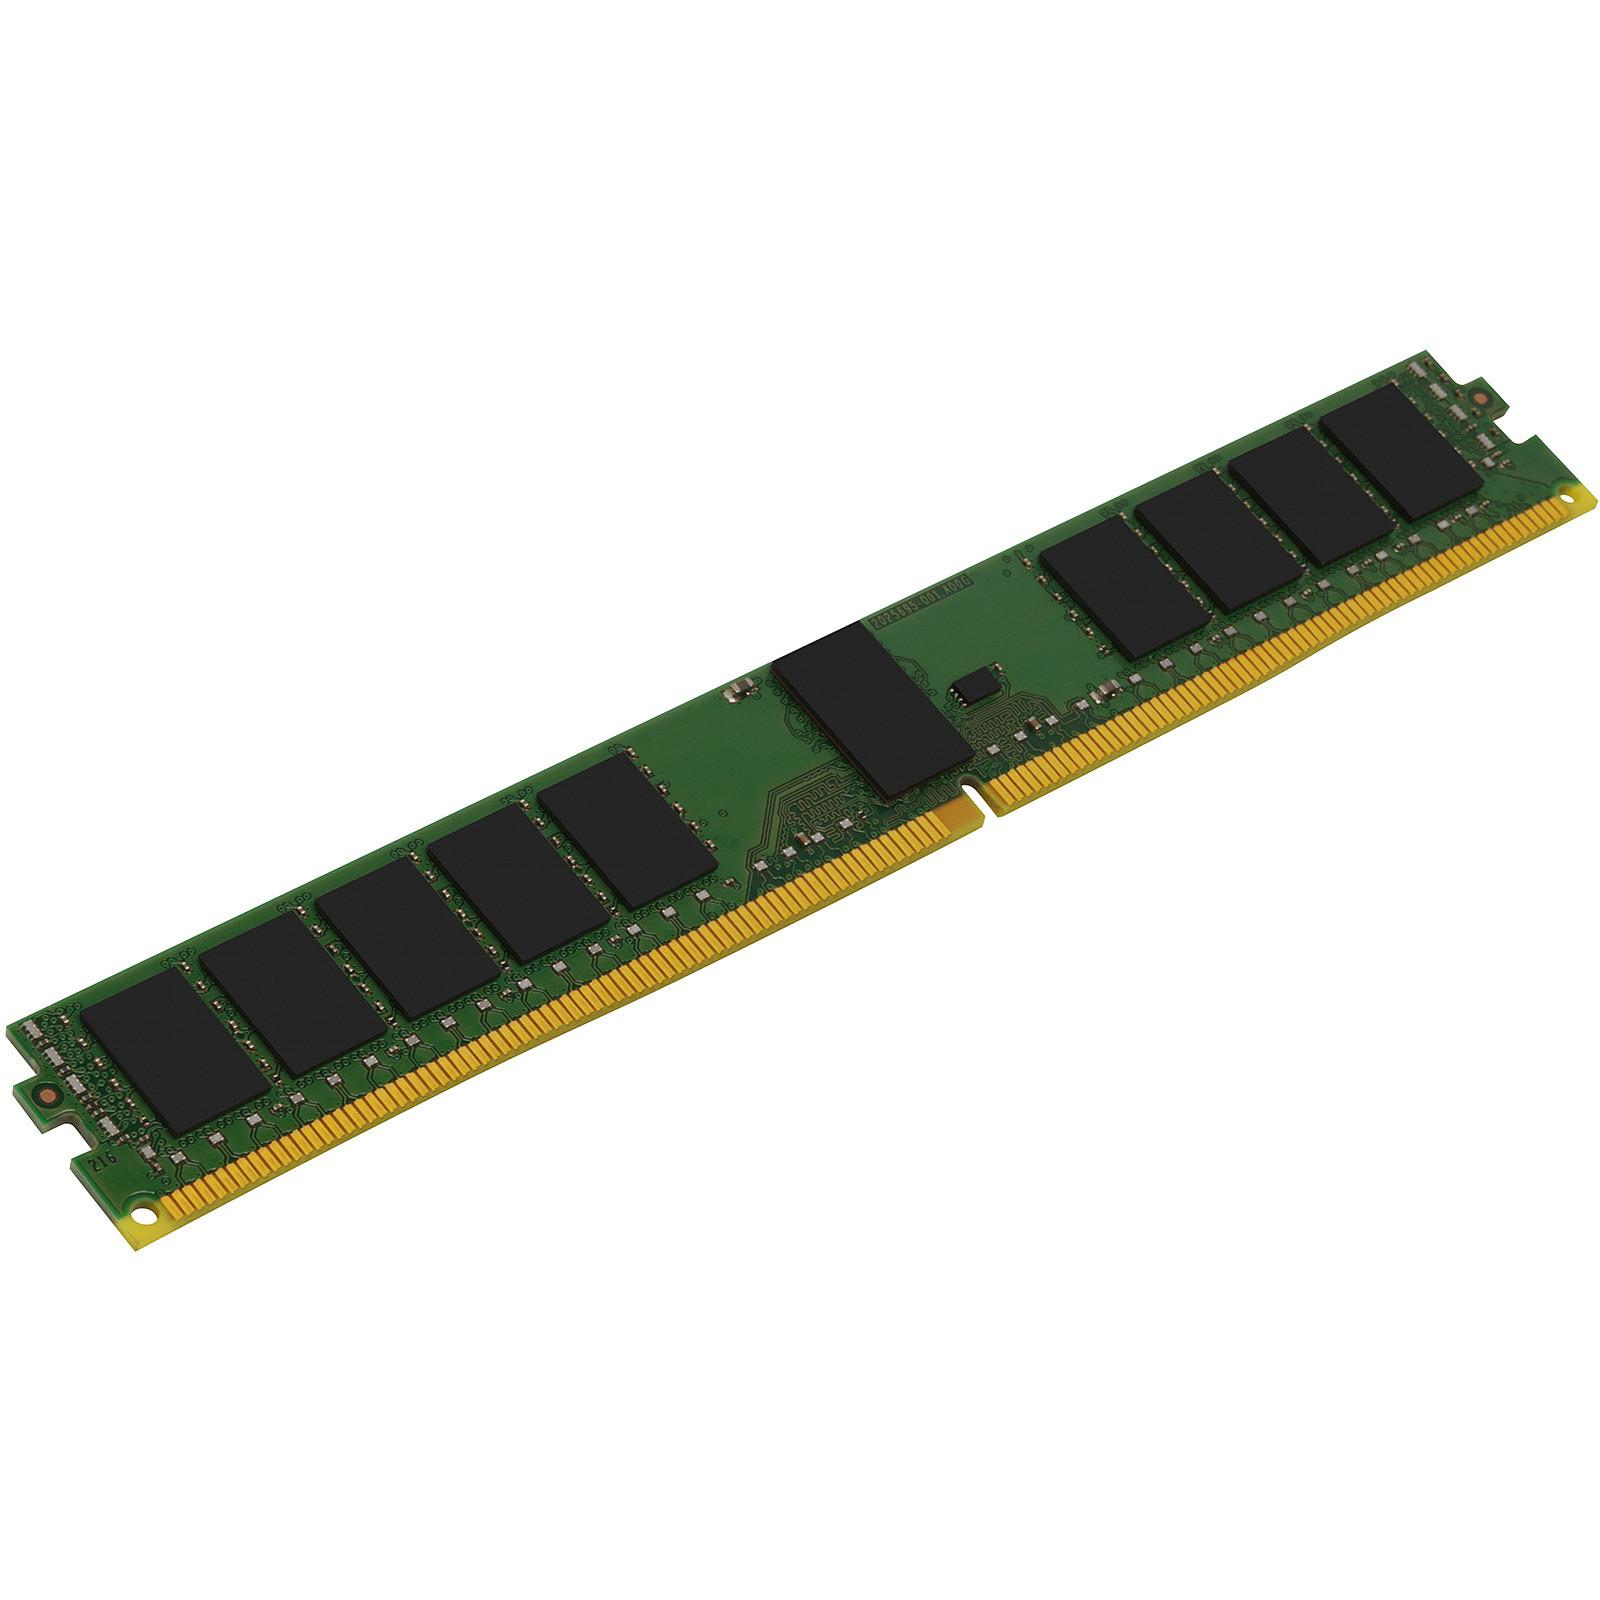 Kingston ValueRAM 8GB DDR4 2400 MHz CL17 1Rx8 VLP